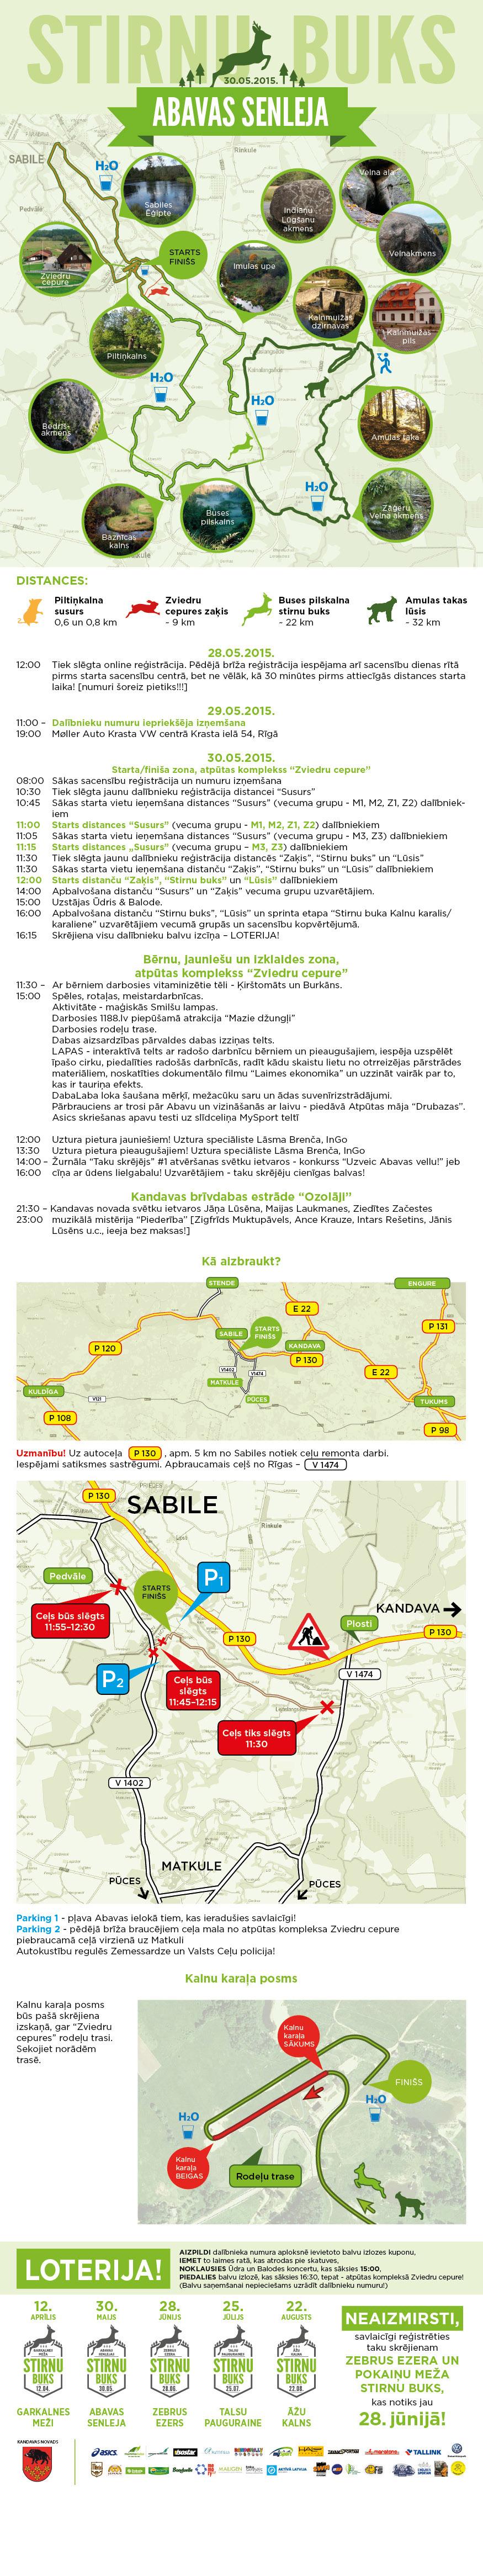 info lapa Abava5